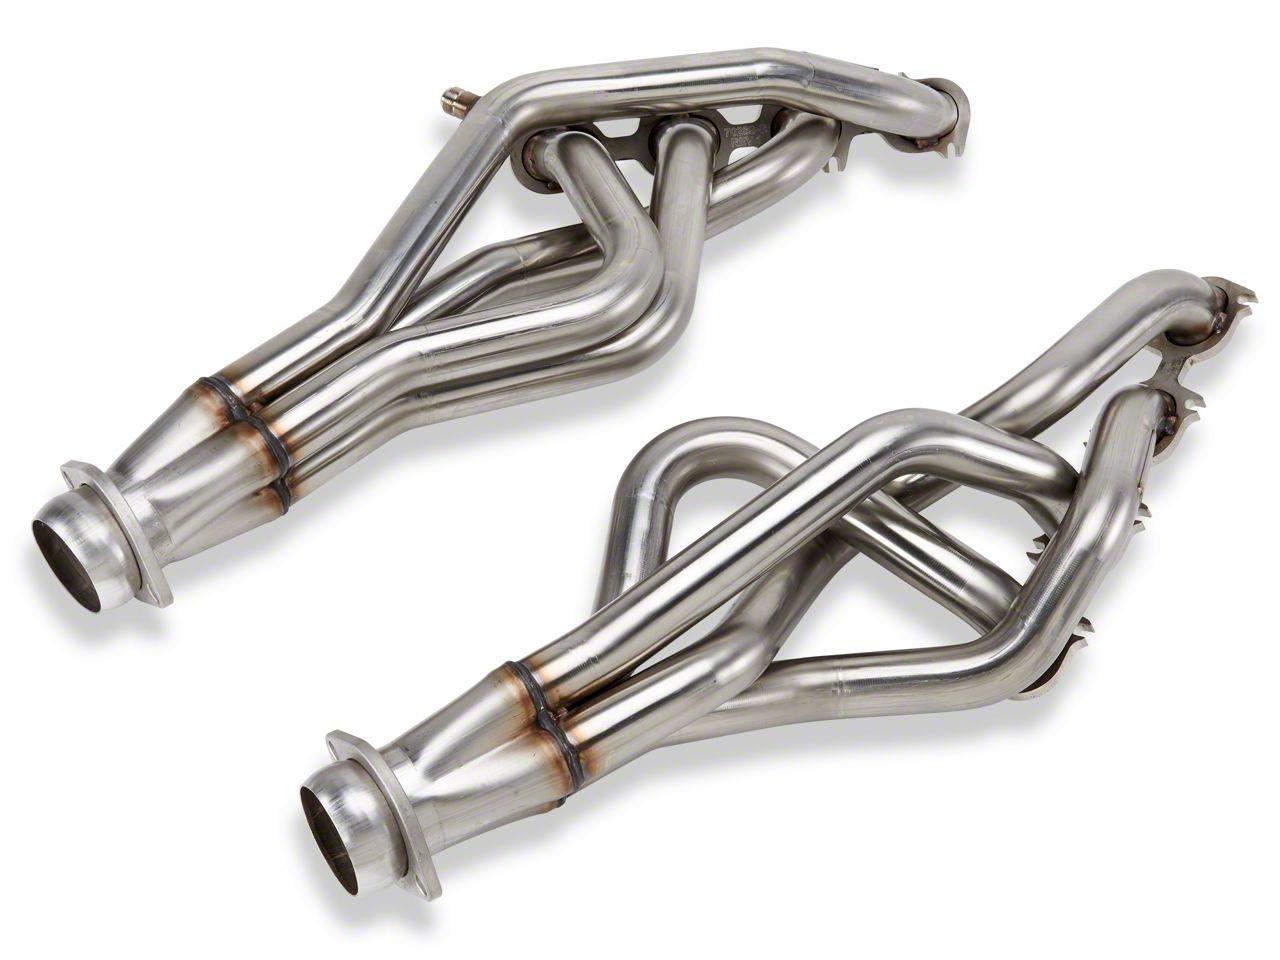 Kooks 1-3/4 in. Long Tube Headers (11-14 GT500)